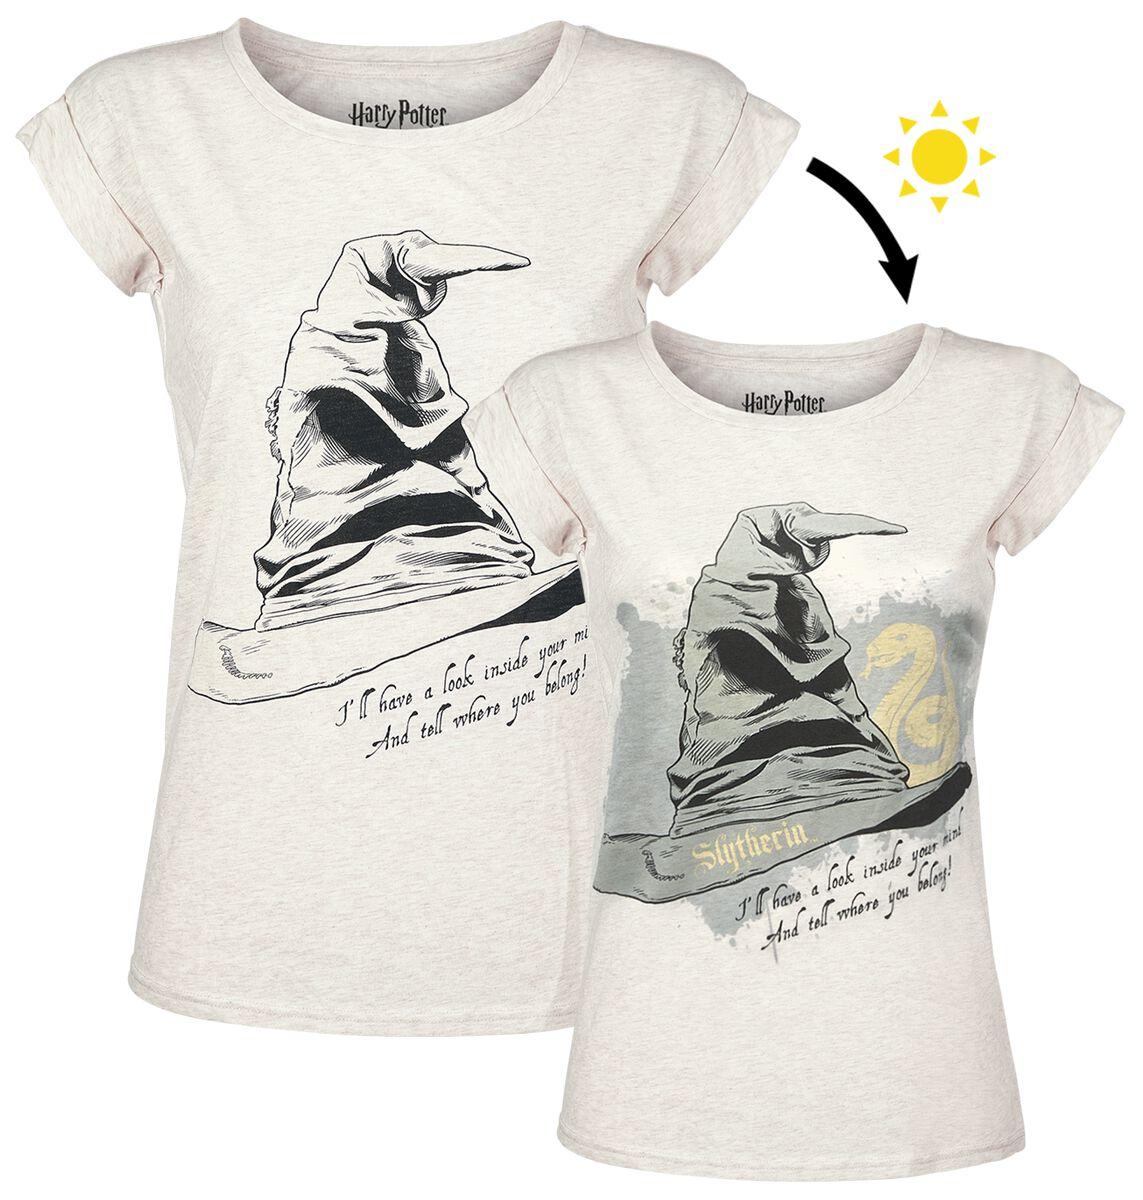 Harry Potter Der sprechende Hut - Slytherin Koszulka damska biały